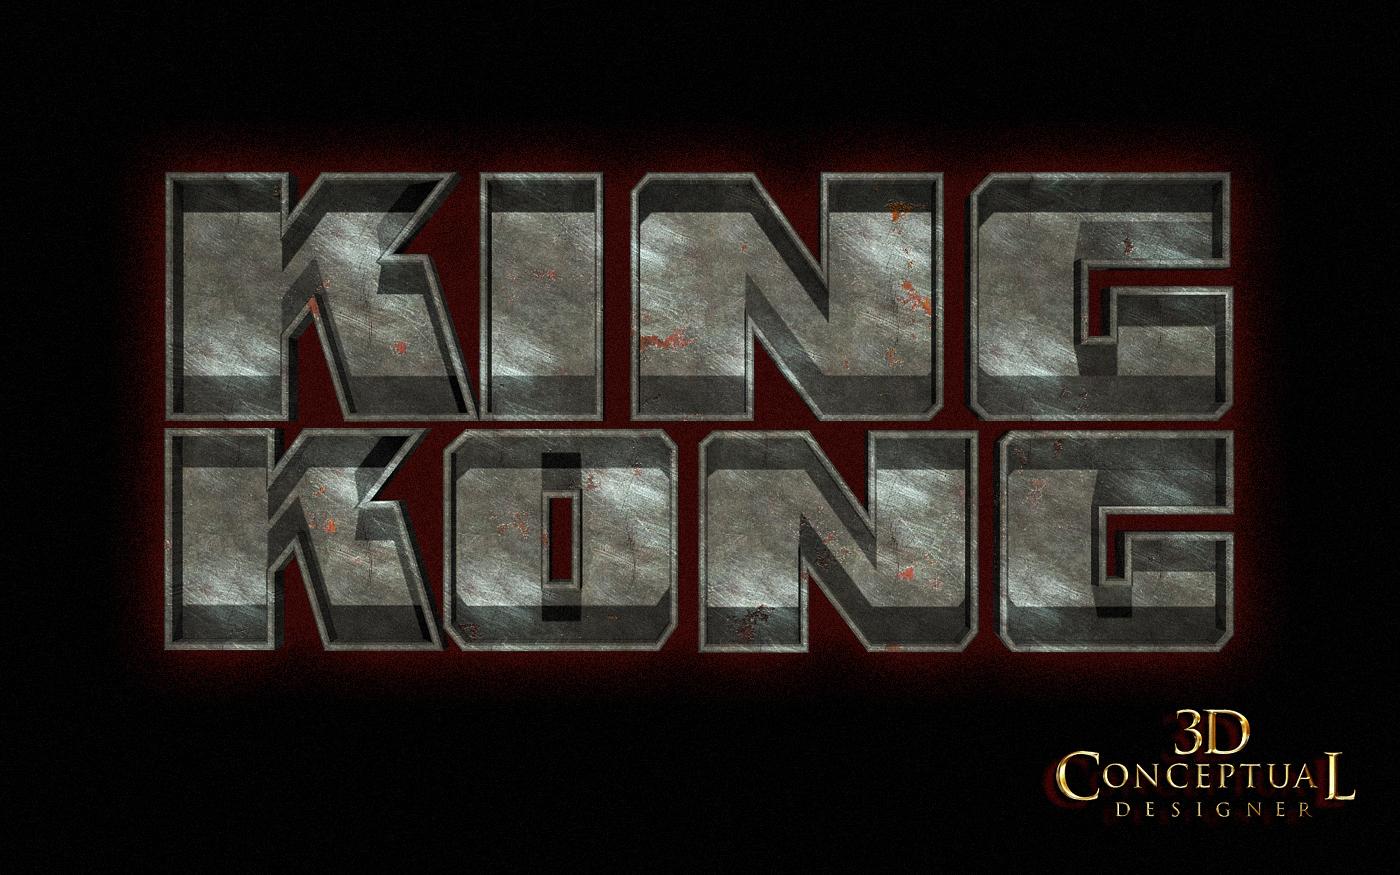 3dconceptualdesignerblog project review king kong 2005 3d logo designs part ii - King kong design ...